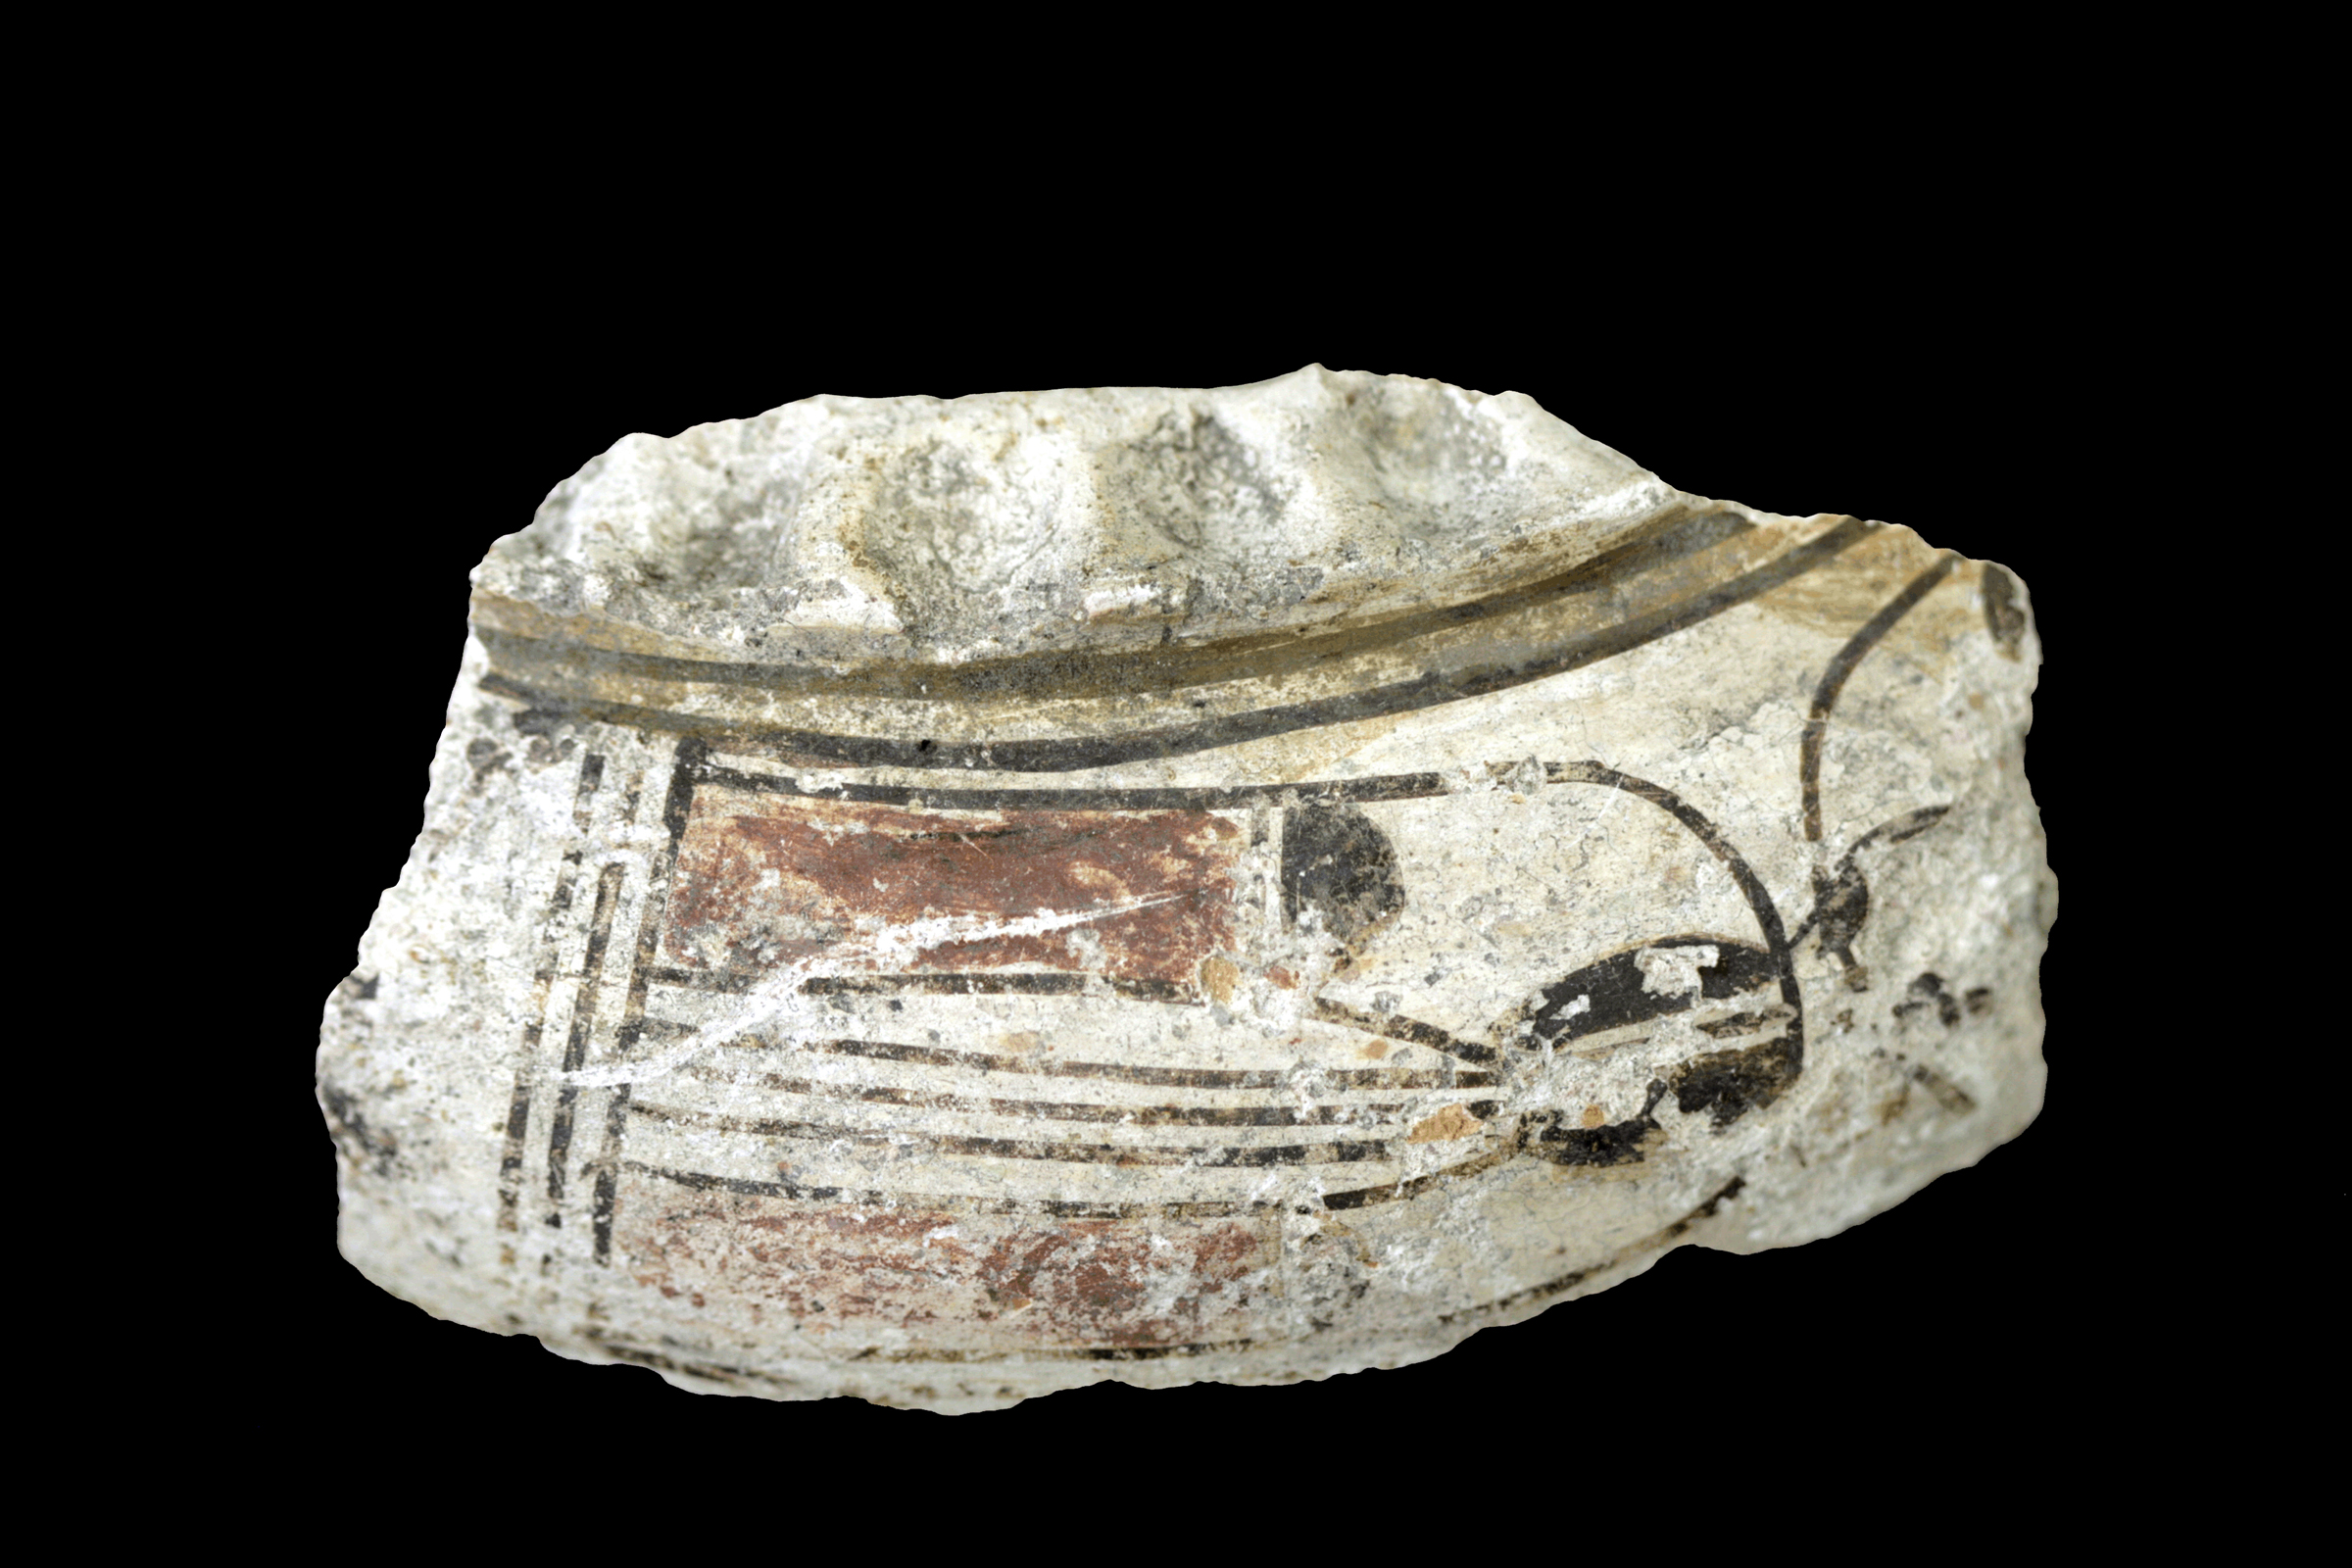 Native American Pottery In Historic Period Tucson